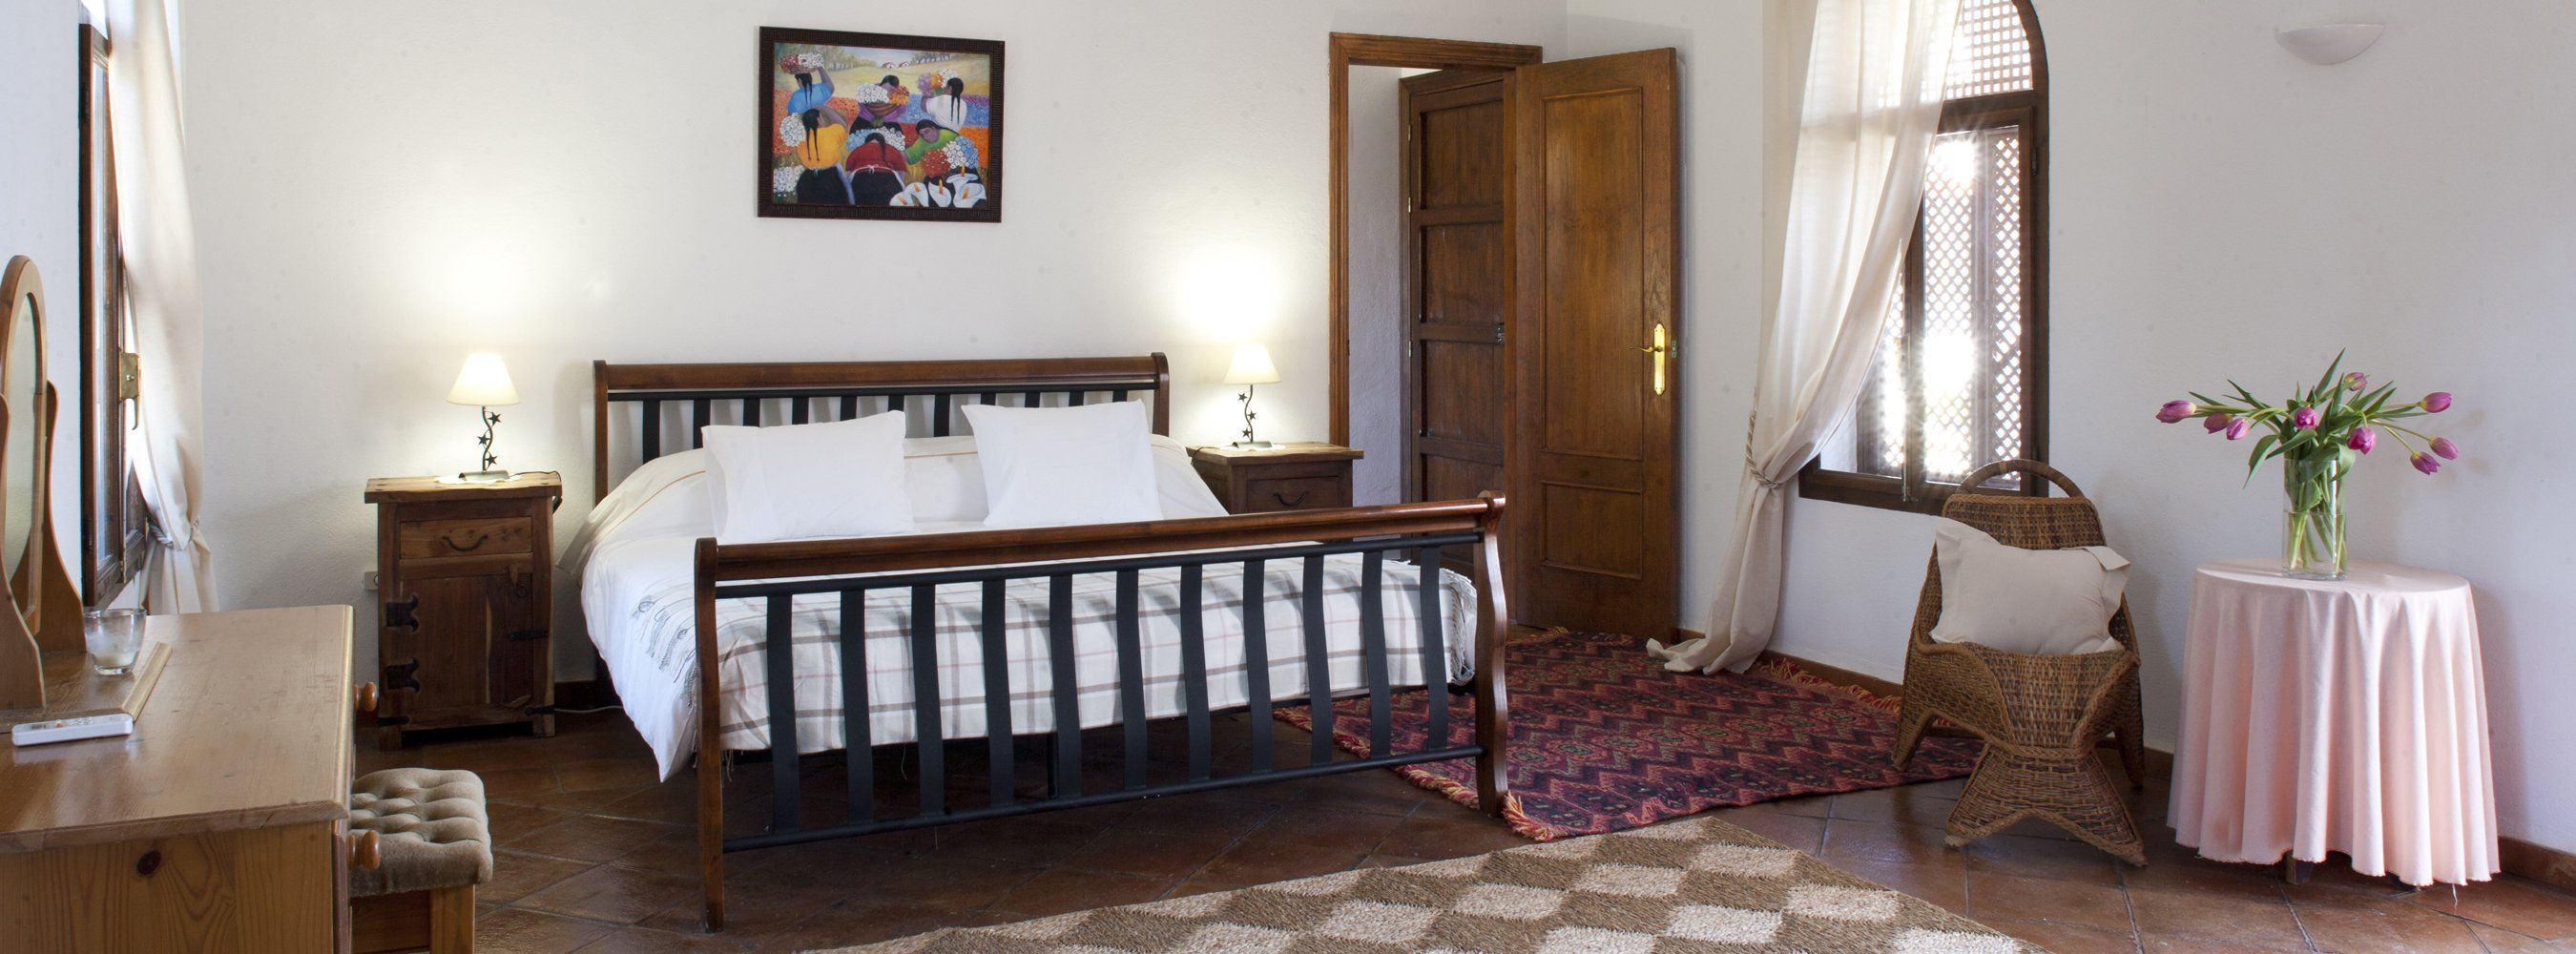 bedroom andalucia villa